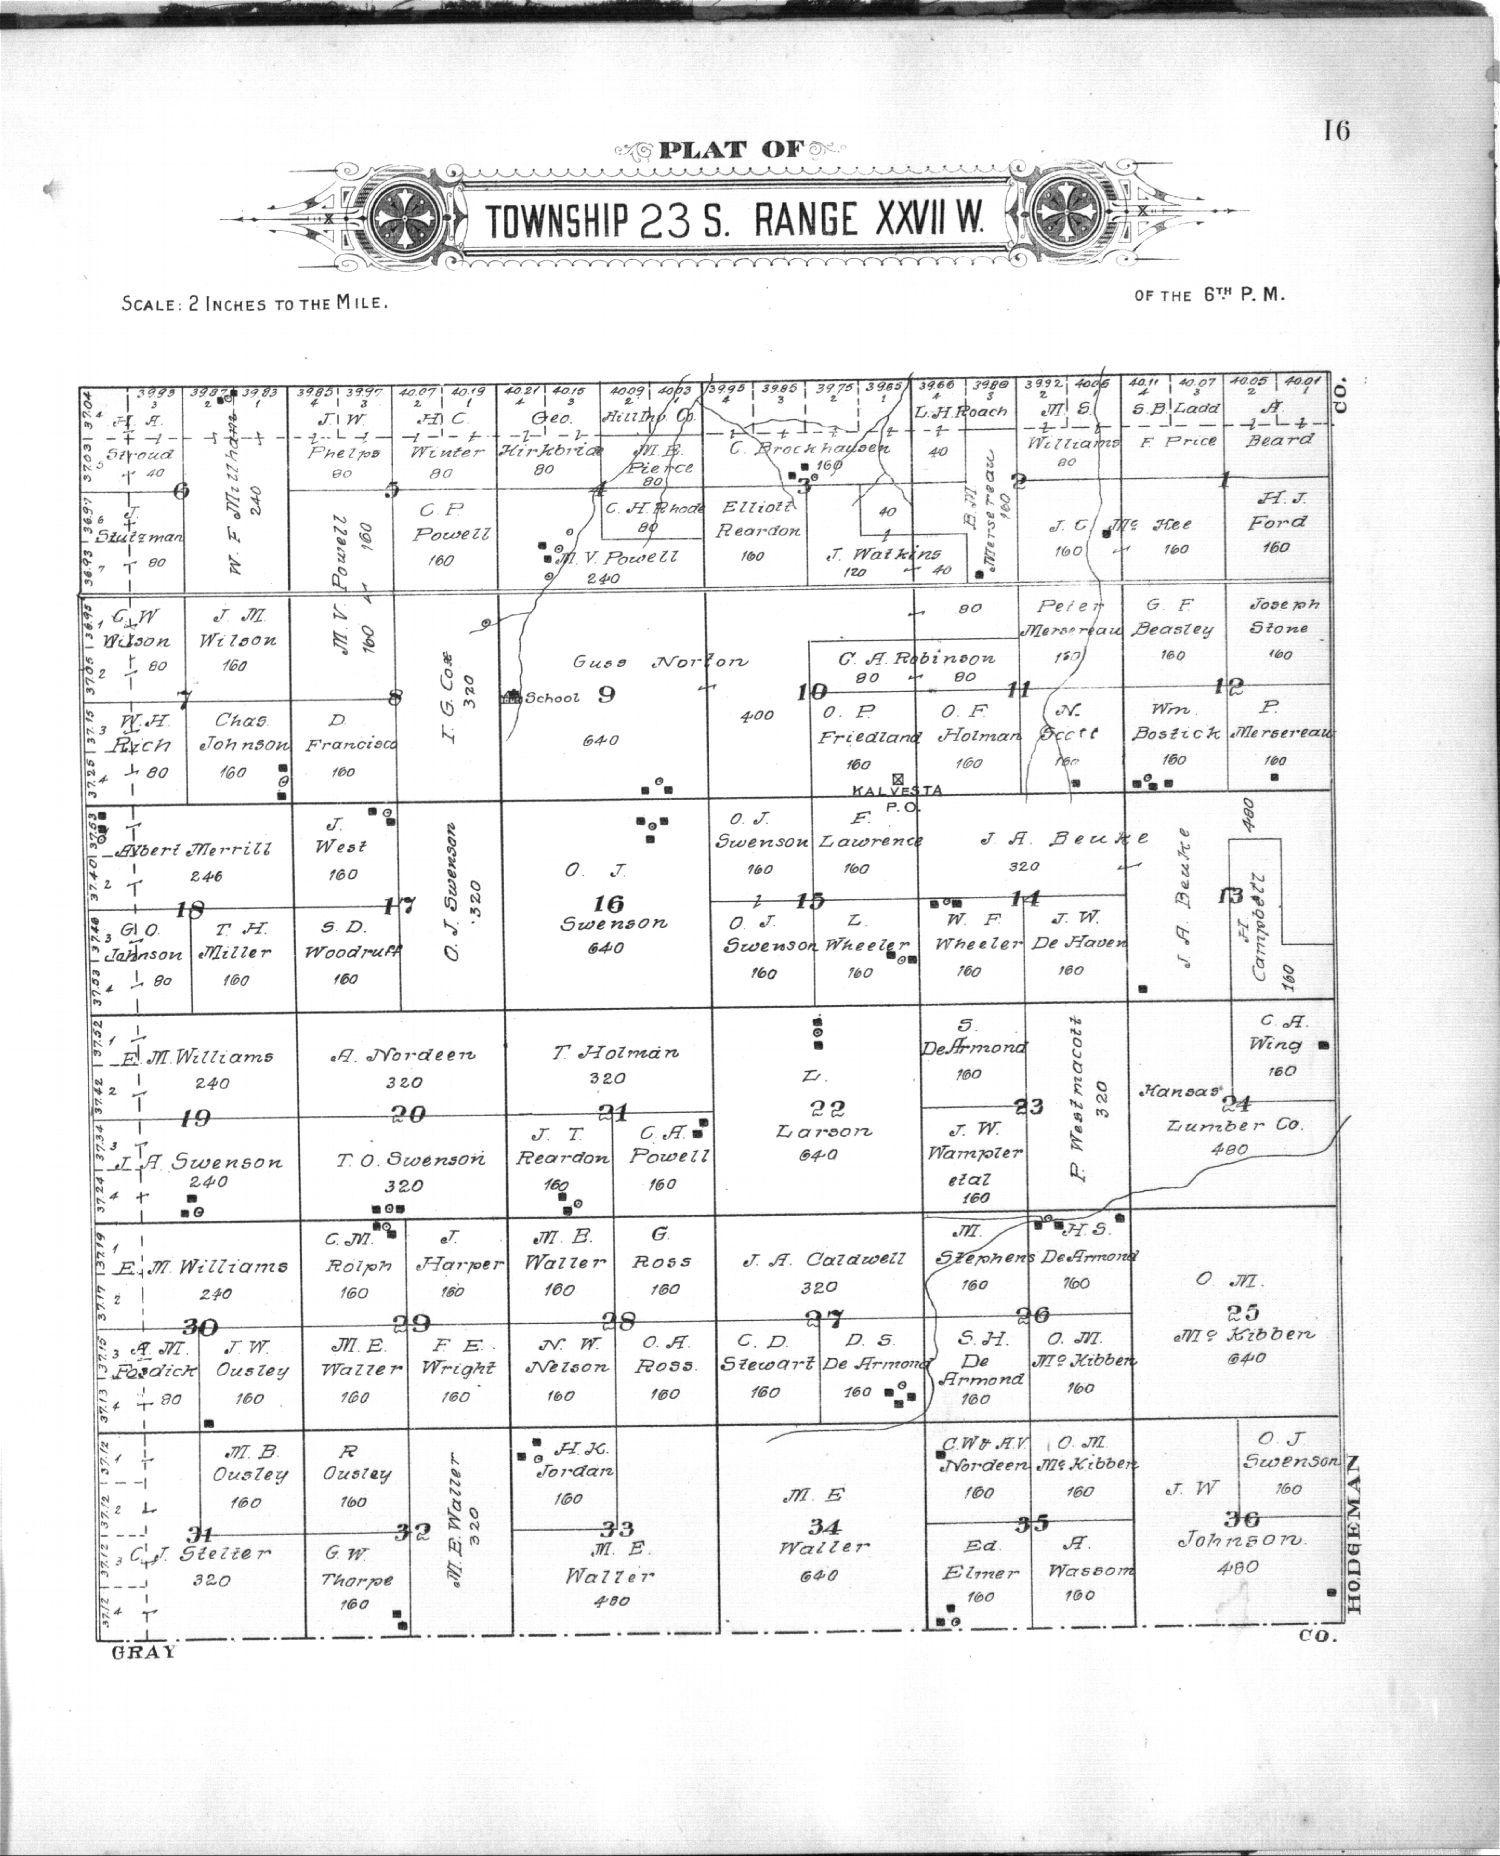 Plat book of Finney County, Kansas - 8